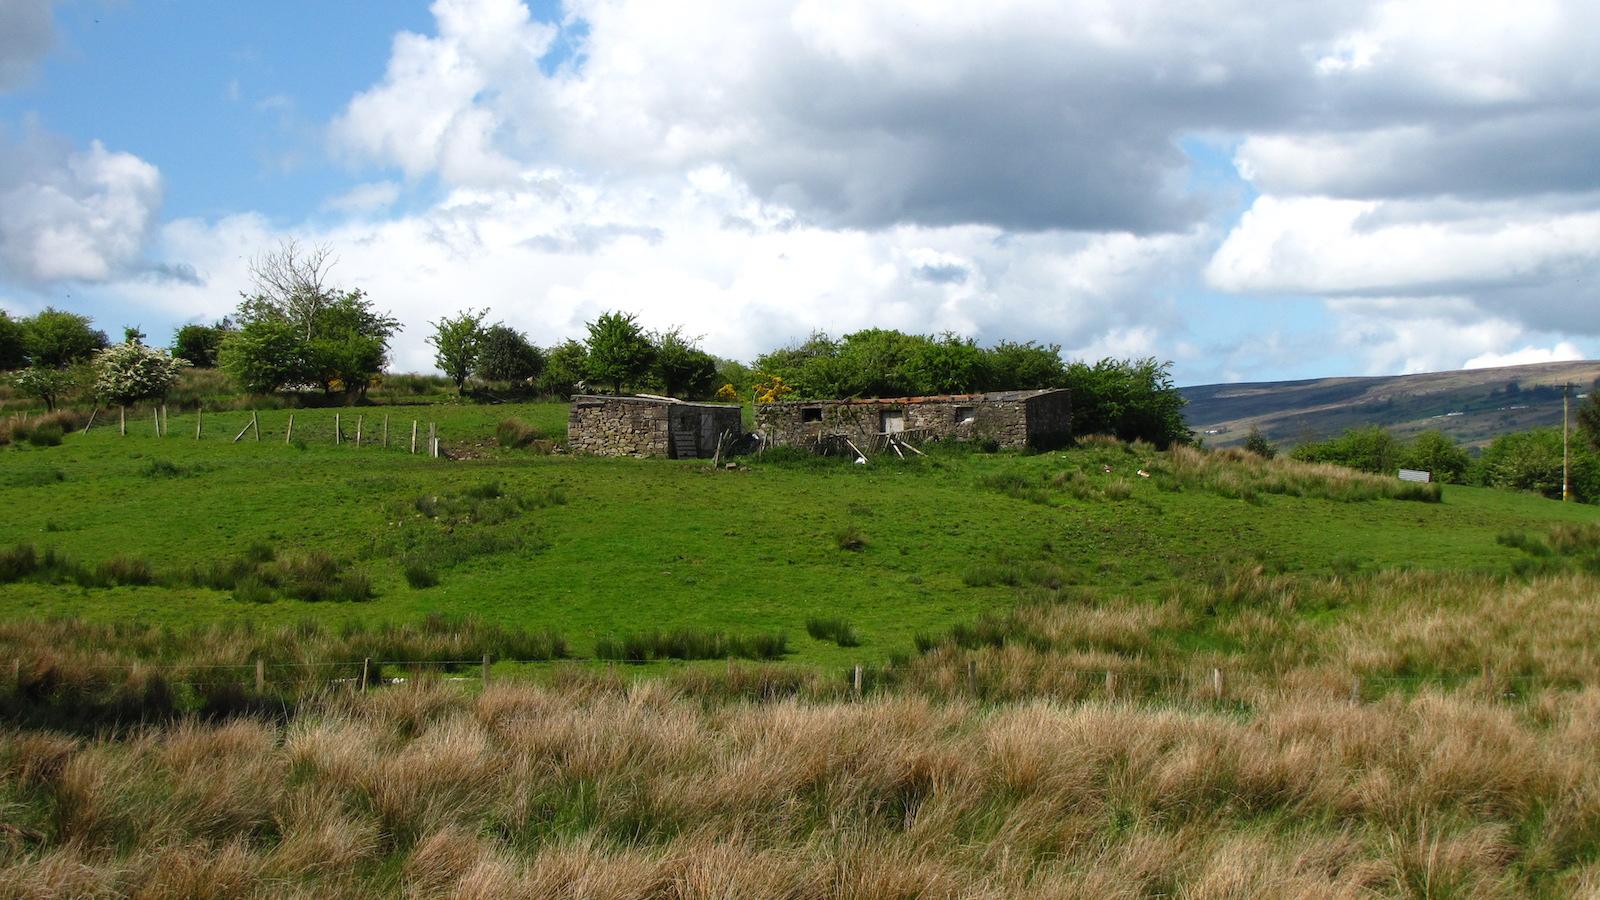 Landscape view of Roscommon, Ireland. Photo by James McNamara, 2009.